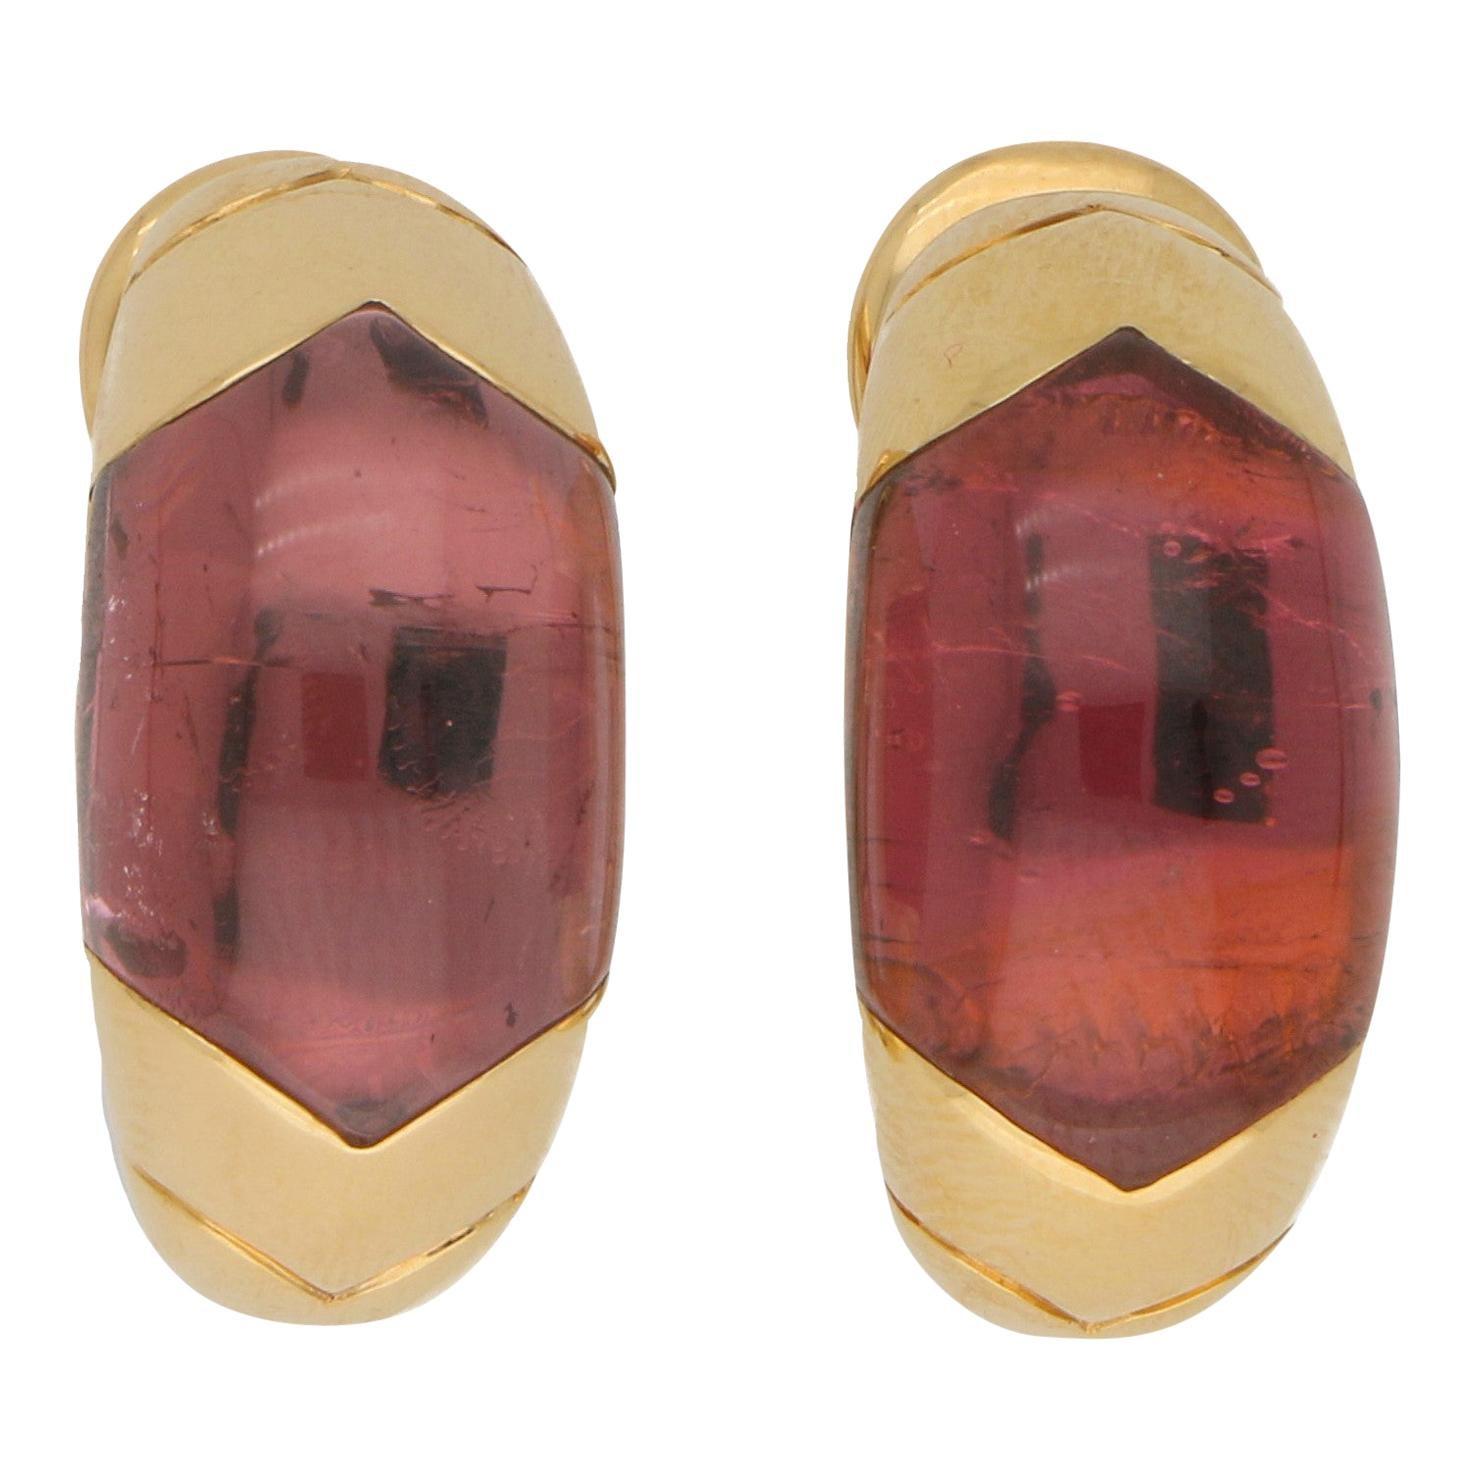 Bvlgari Tronchetto Pink Tourmaline Clip Earrings Set in 18 Karat Yellow Gold